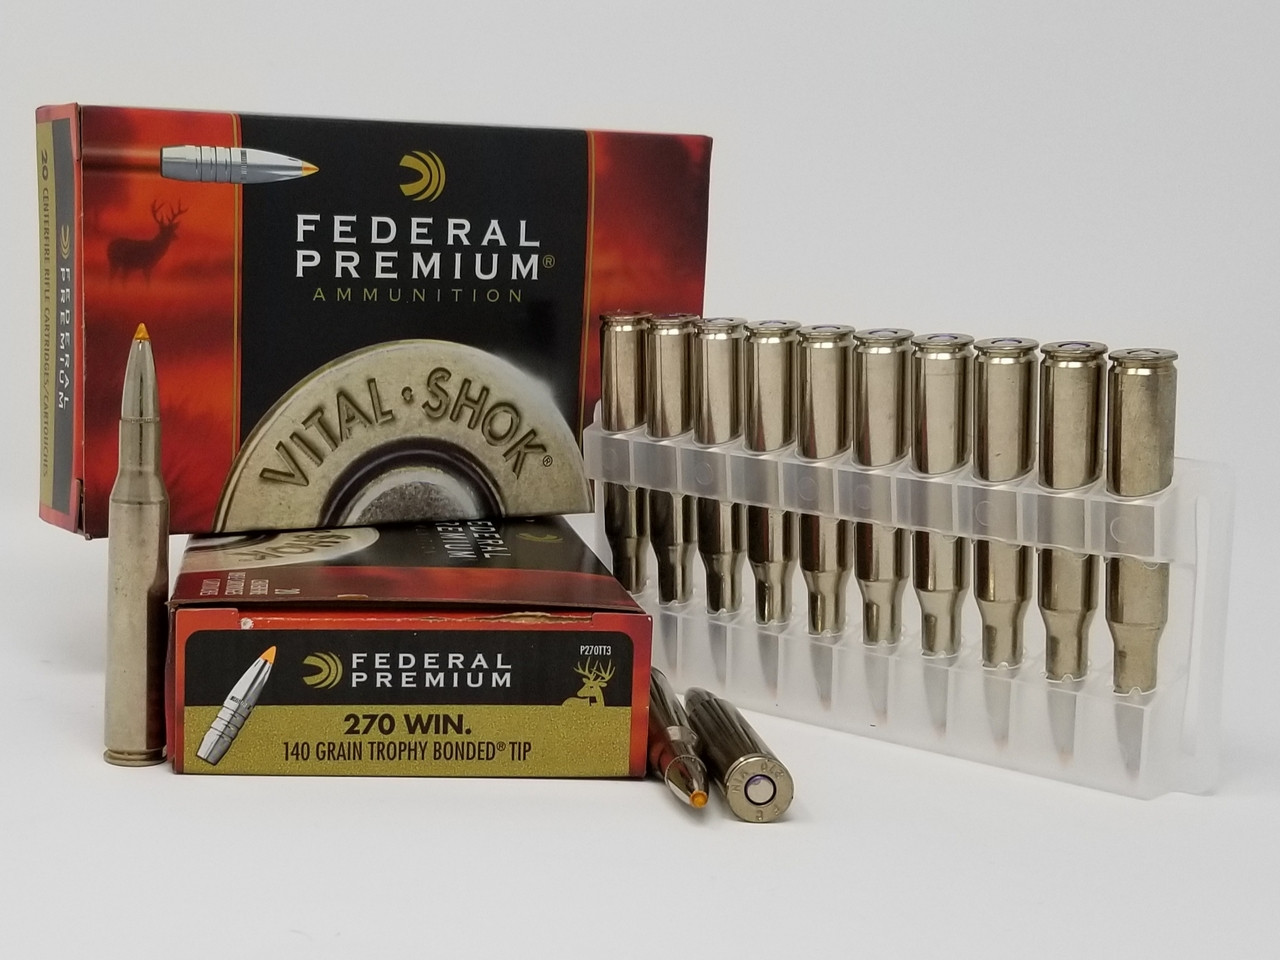 Federal 270 Win Ammunition Vital-Shok P270TT3 140 Grain Trophy Bonded Tip  20 Rounds